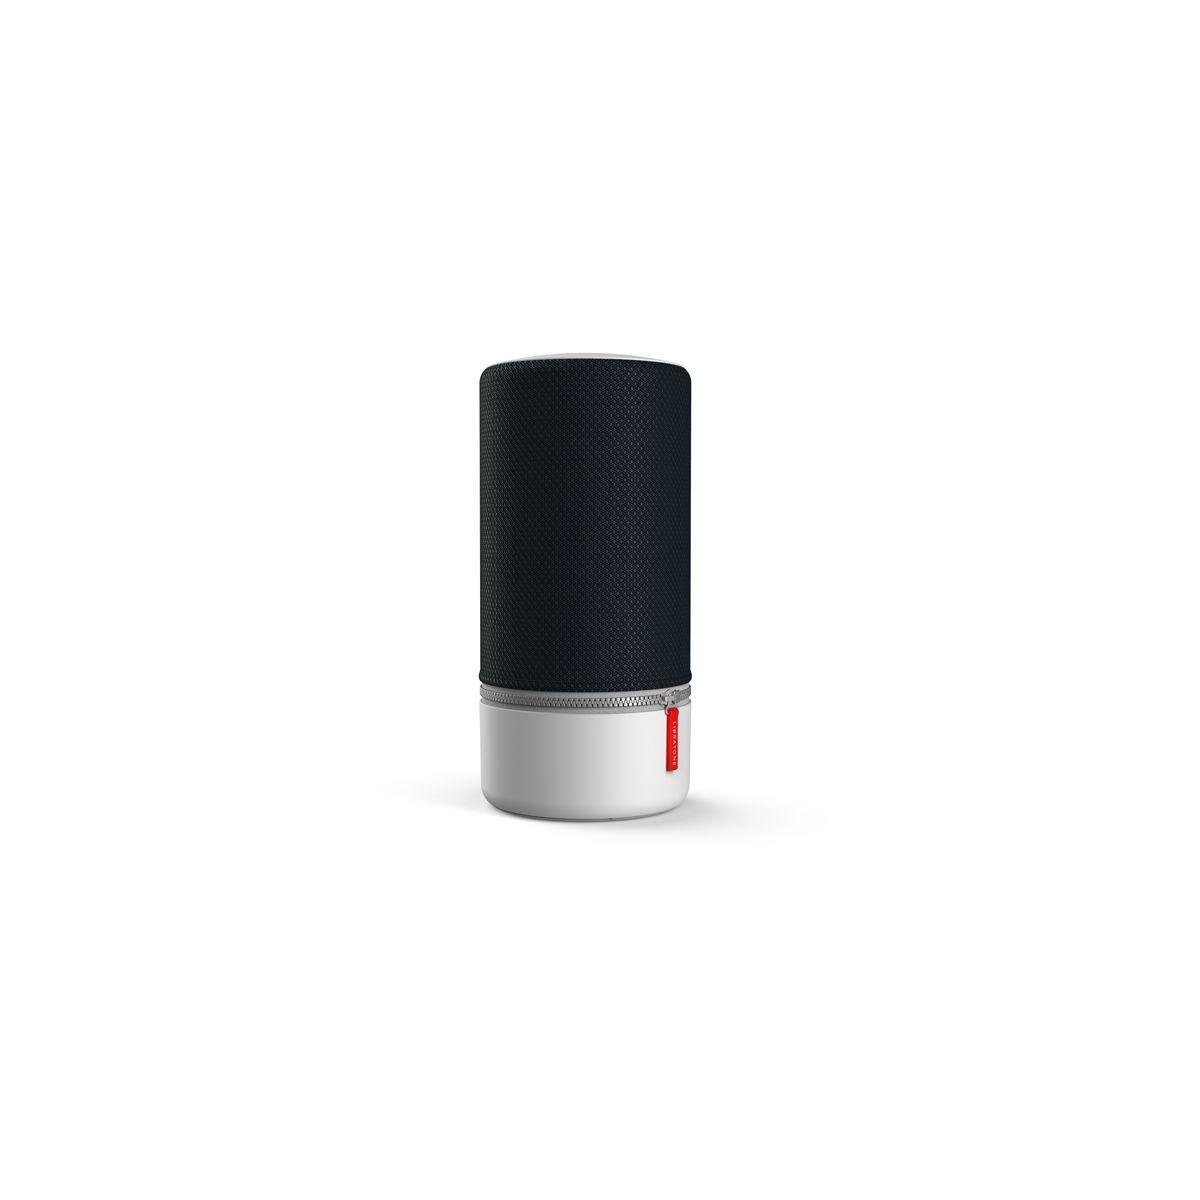 Enceinte multiroom libratone zipp 2 frosty black - livraison offerte : code premium